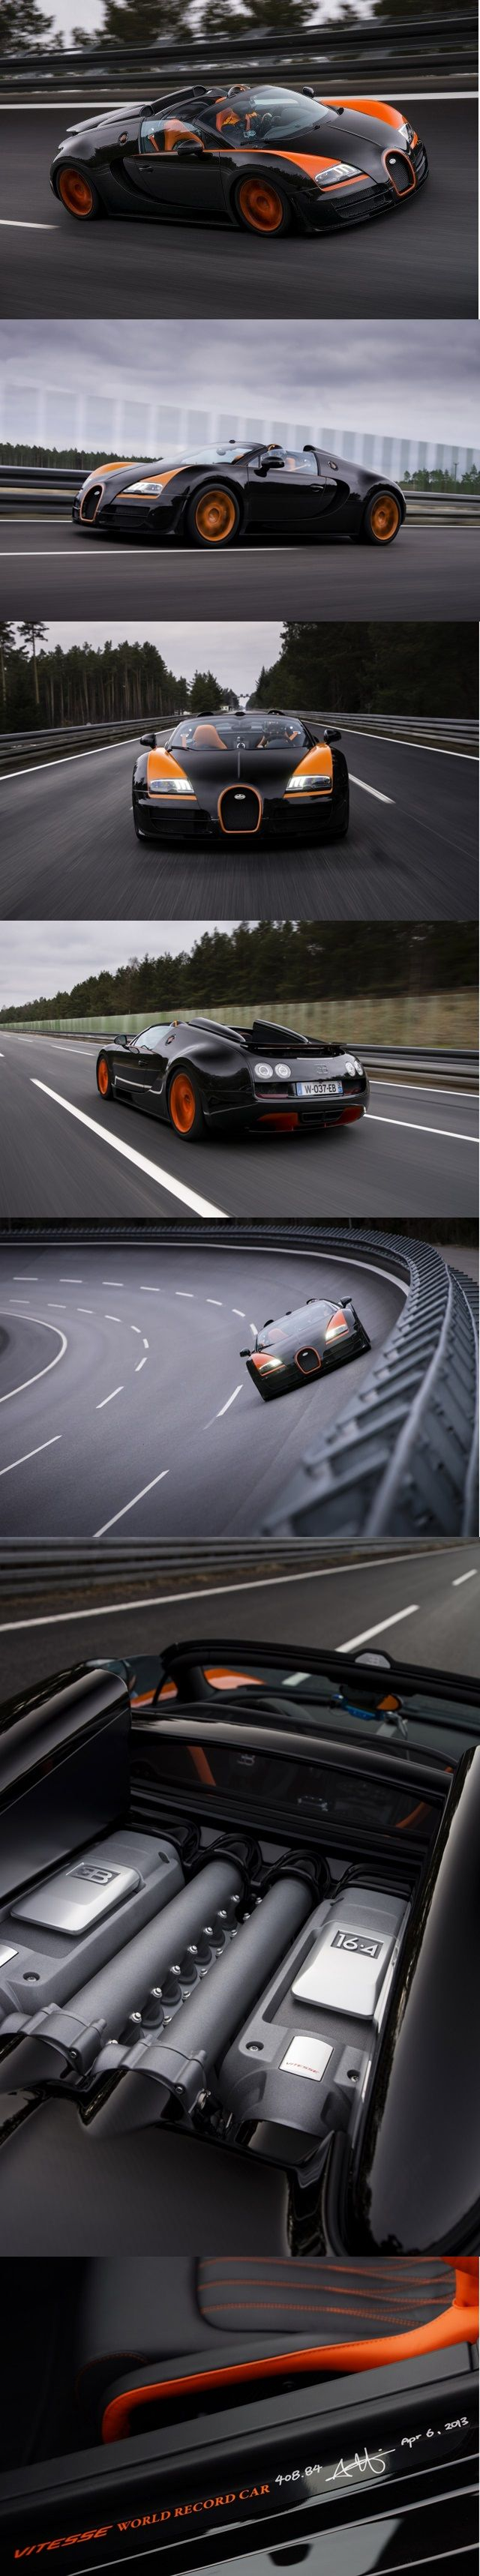 f62a6ffa65f41c62d10fe71aed115d03 Fascinating Bugatti Veyron Grand Sport Vitesse 1/4 Mile Cars Trend